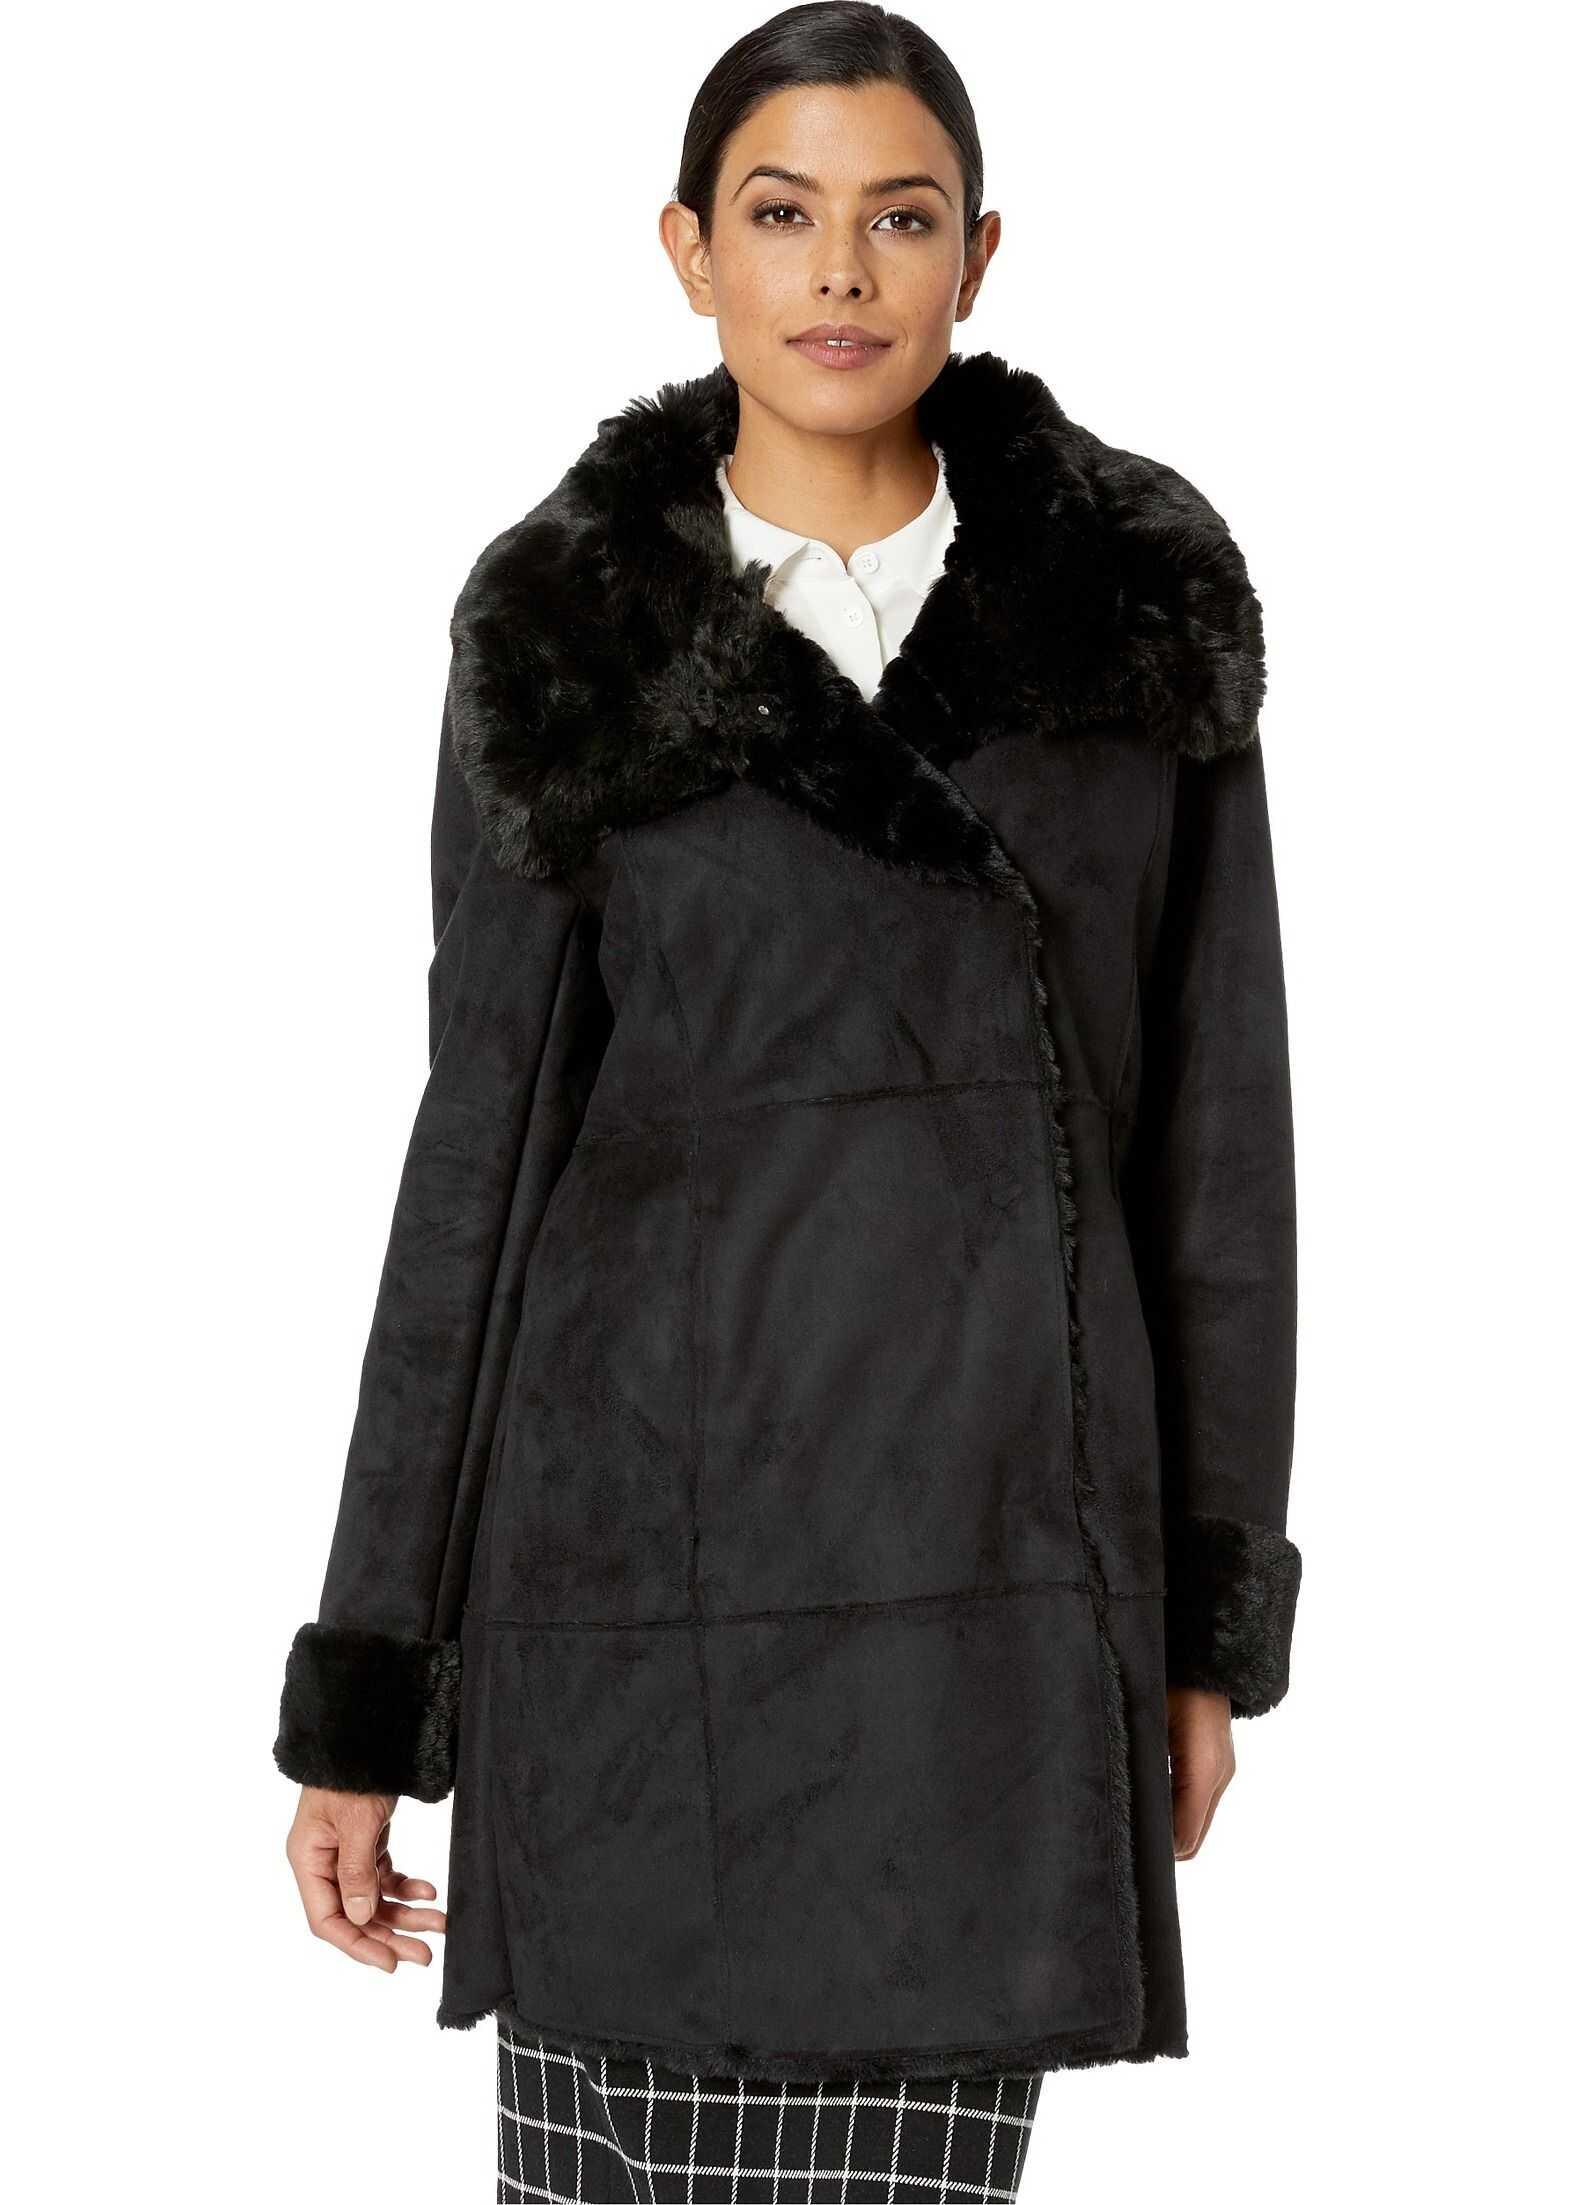 Ralph Lauren Asymmetrical Faux Shearling Coat Black